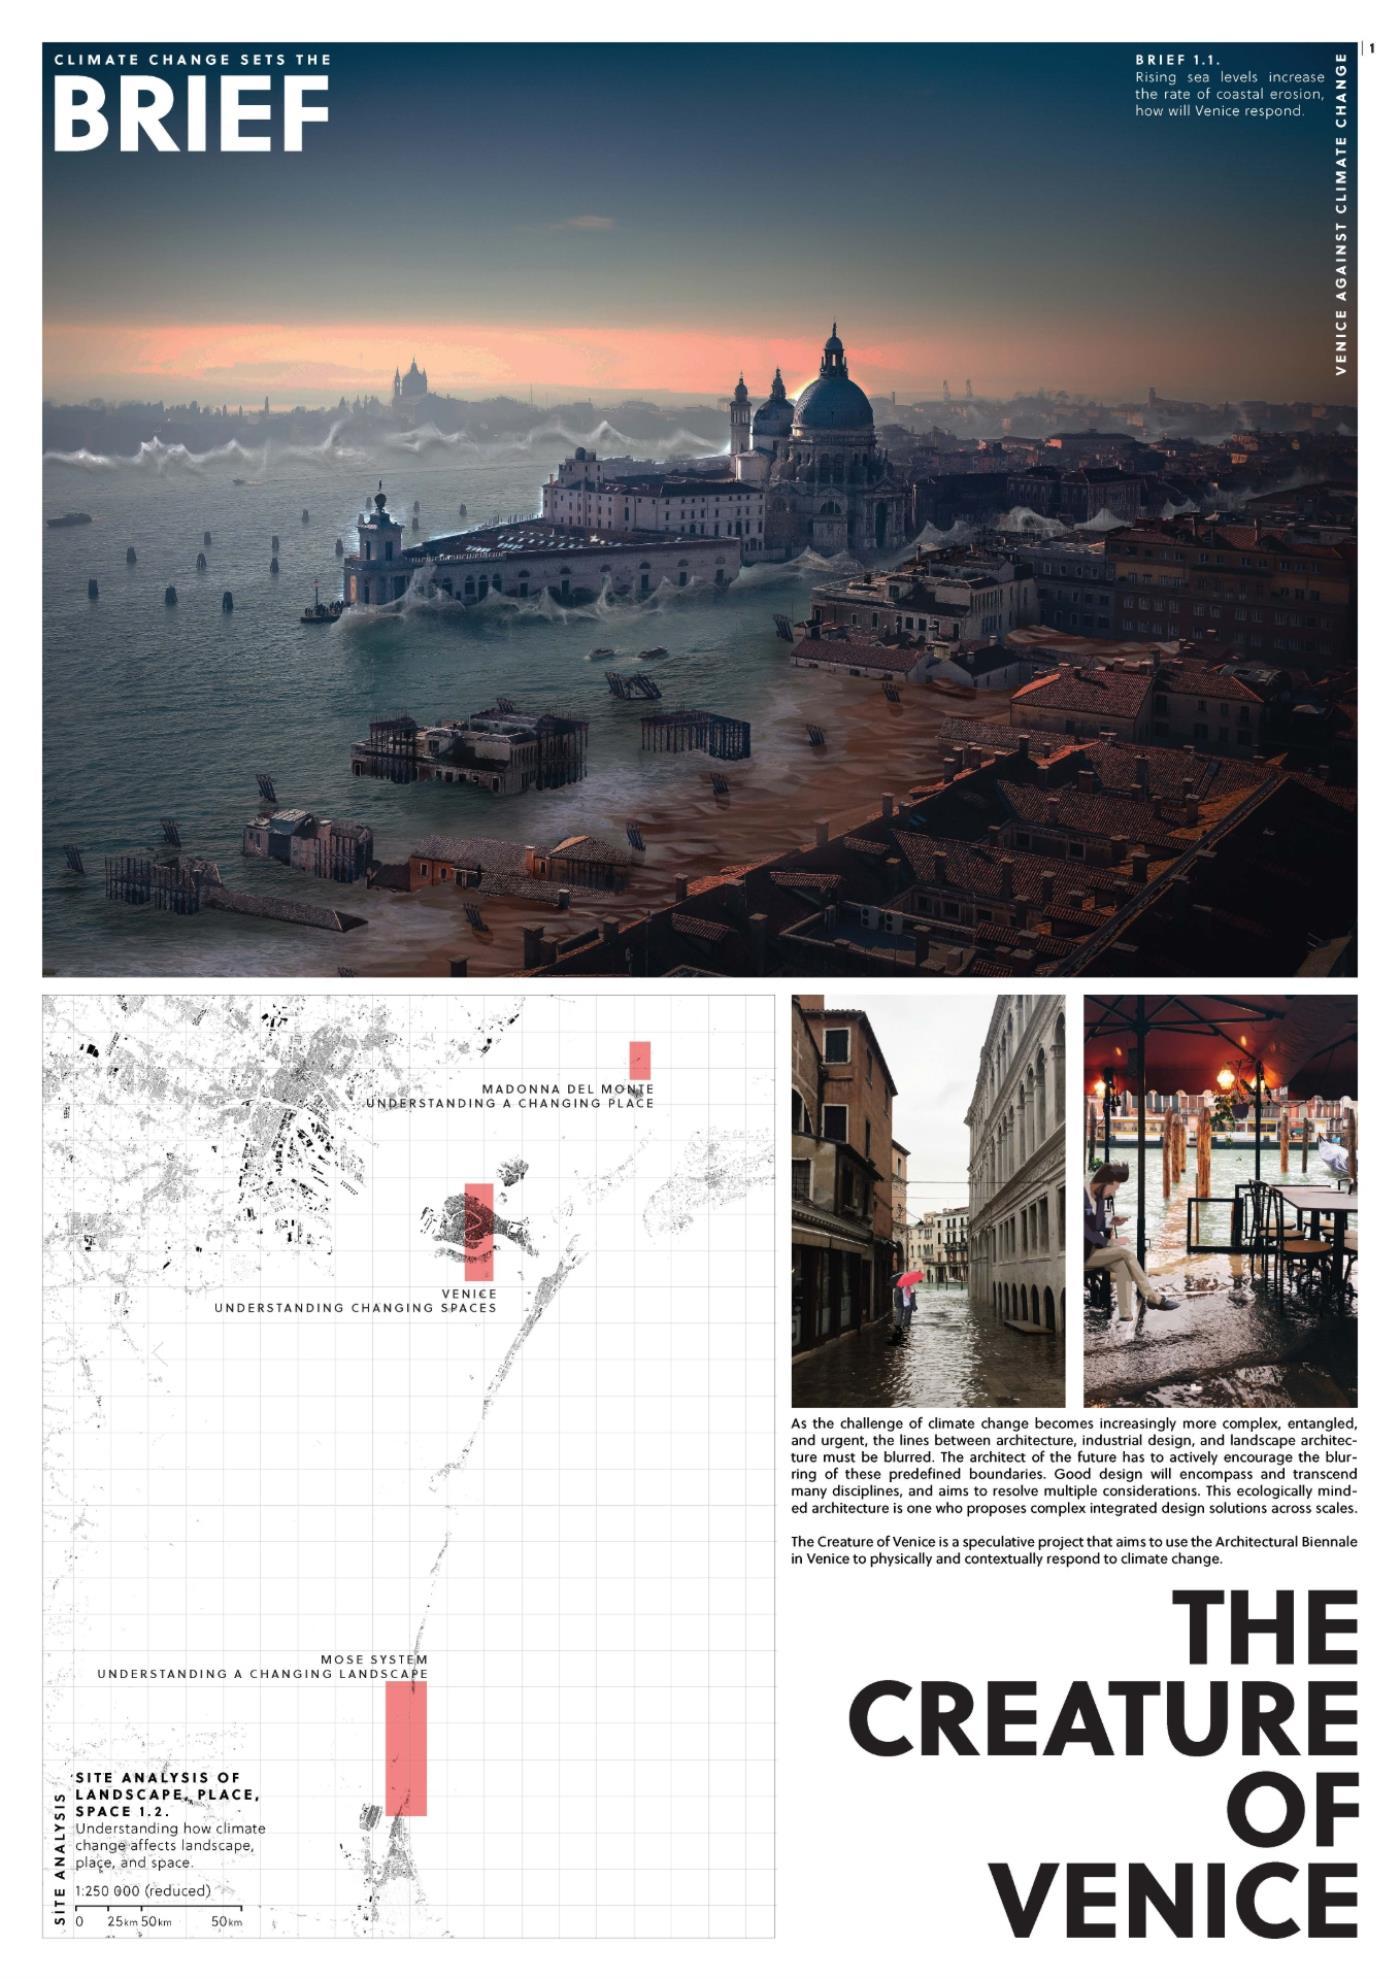 The Creature of Venice